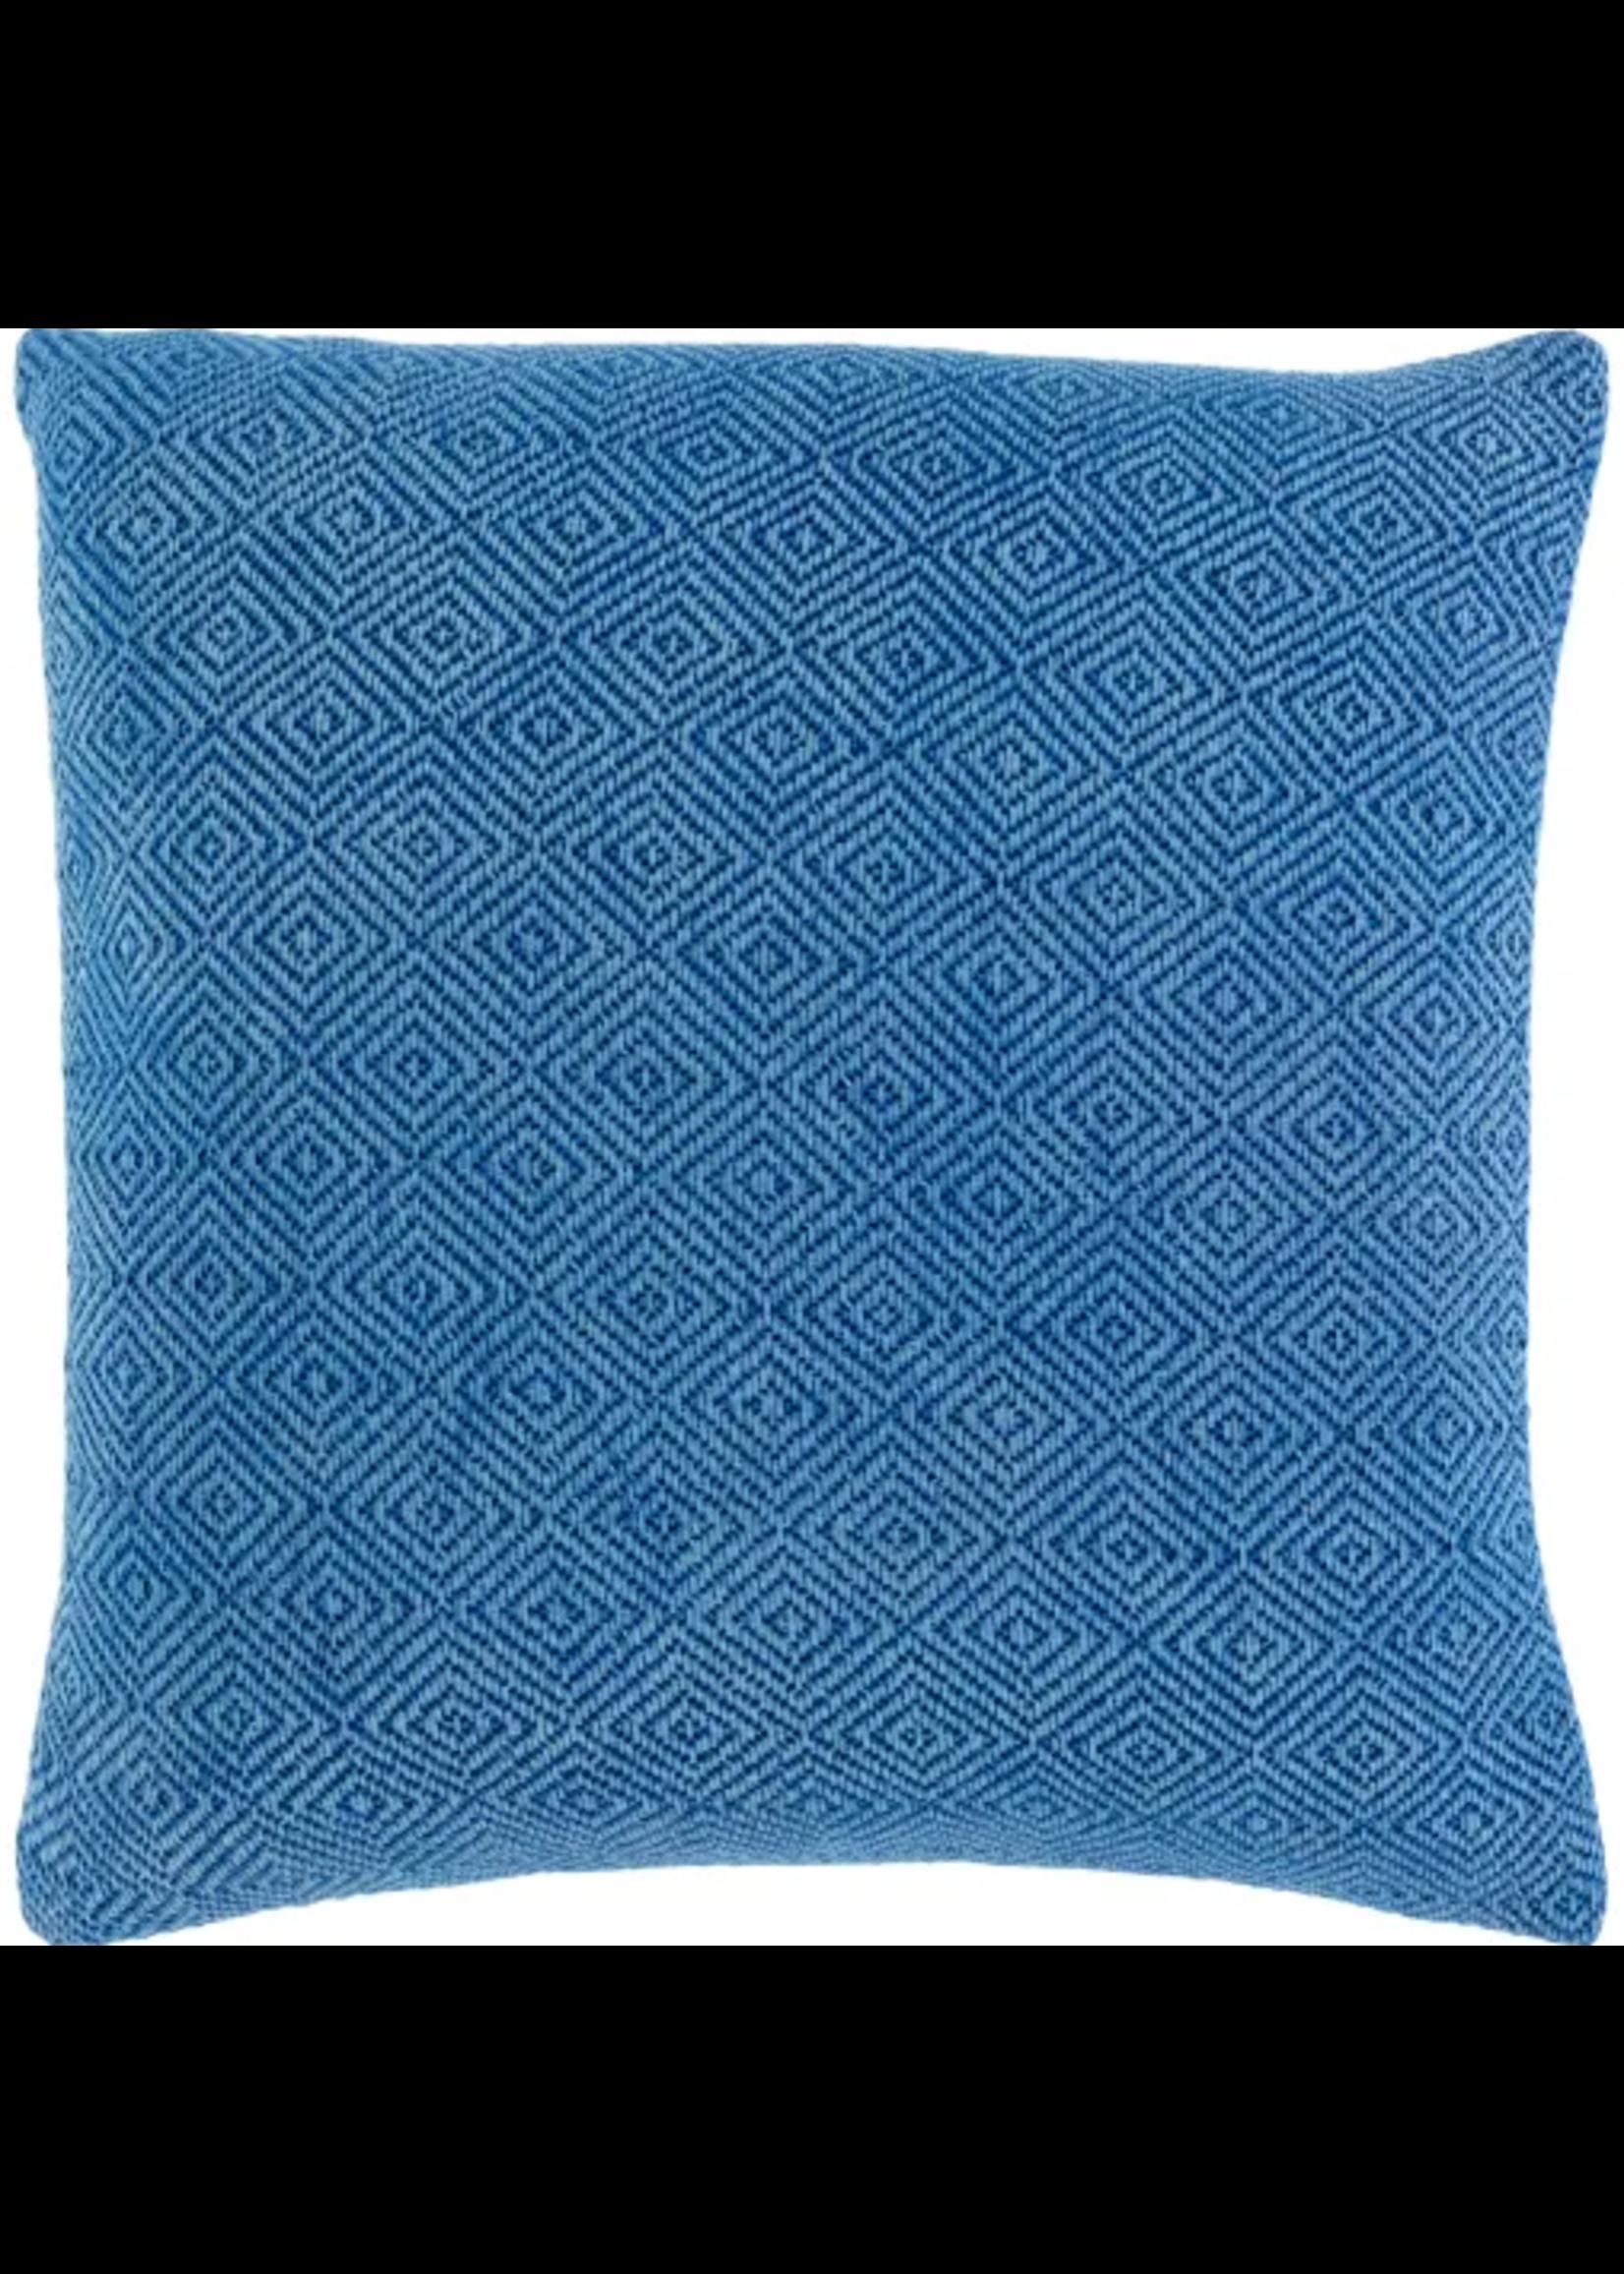 Surya Throw Pillow Blue